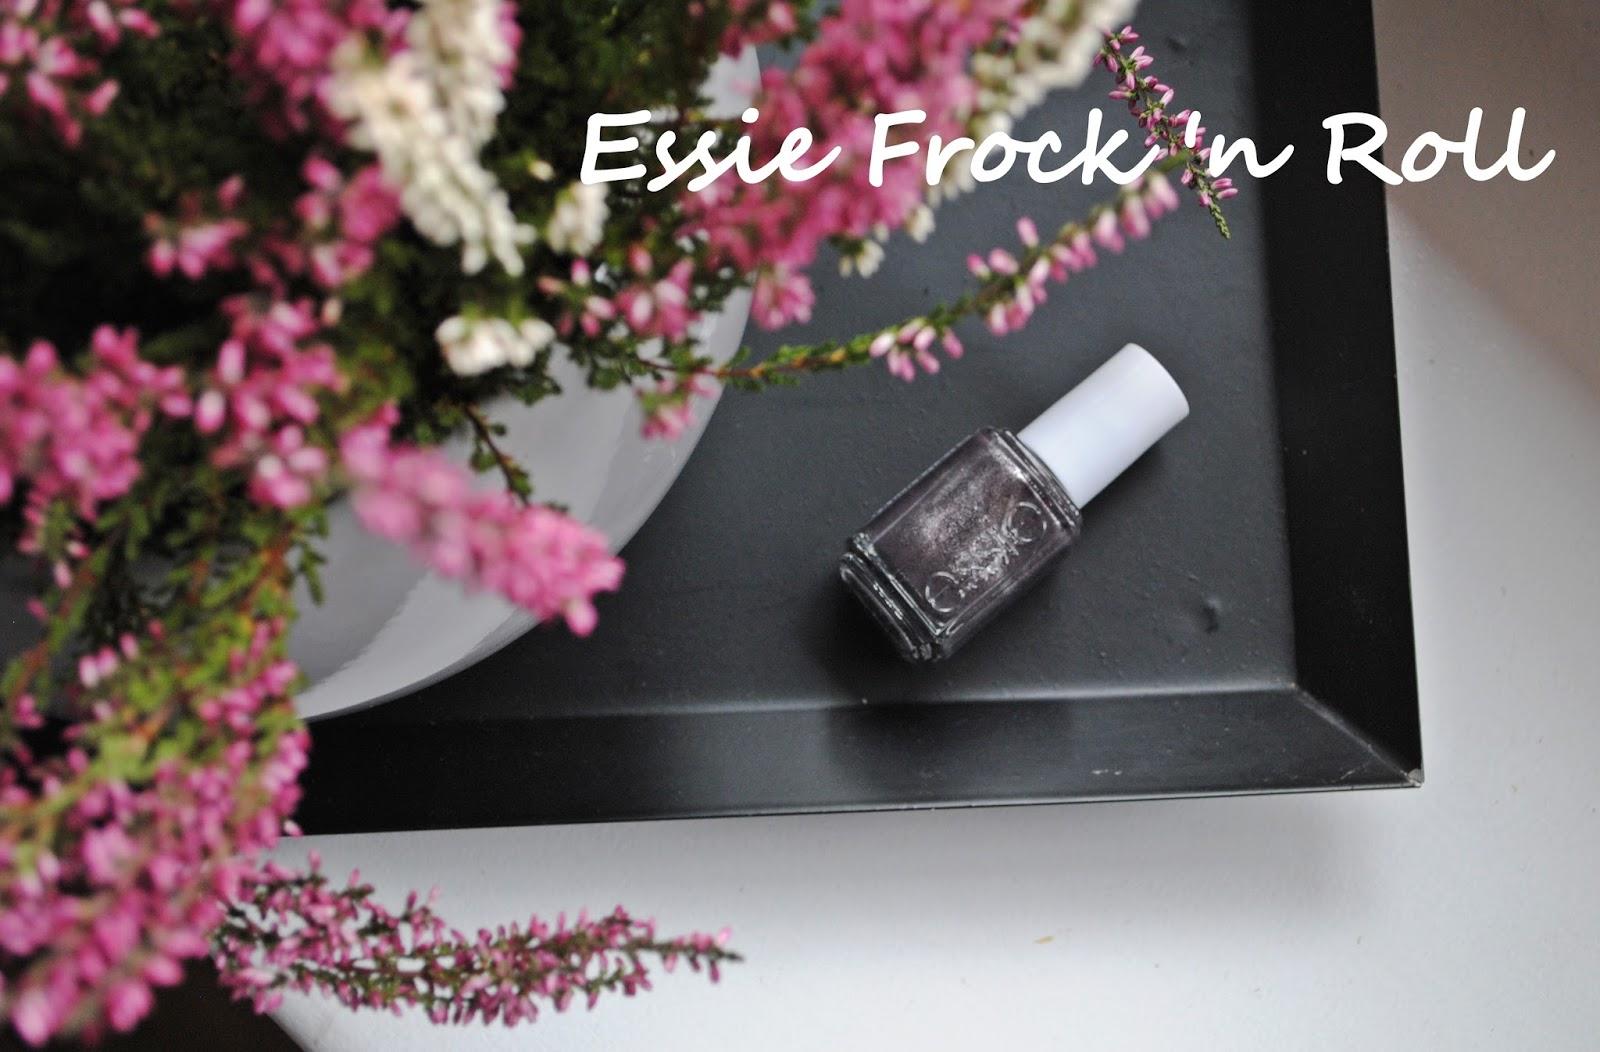 Essie Frock 'n Roll, Fall 2015 beautypediapatt.blogspot.com